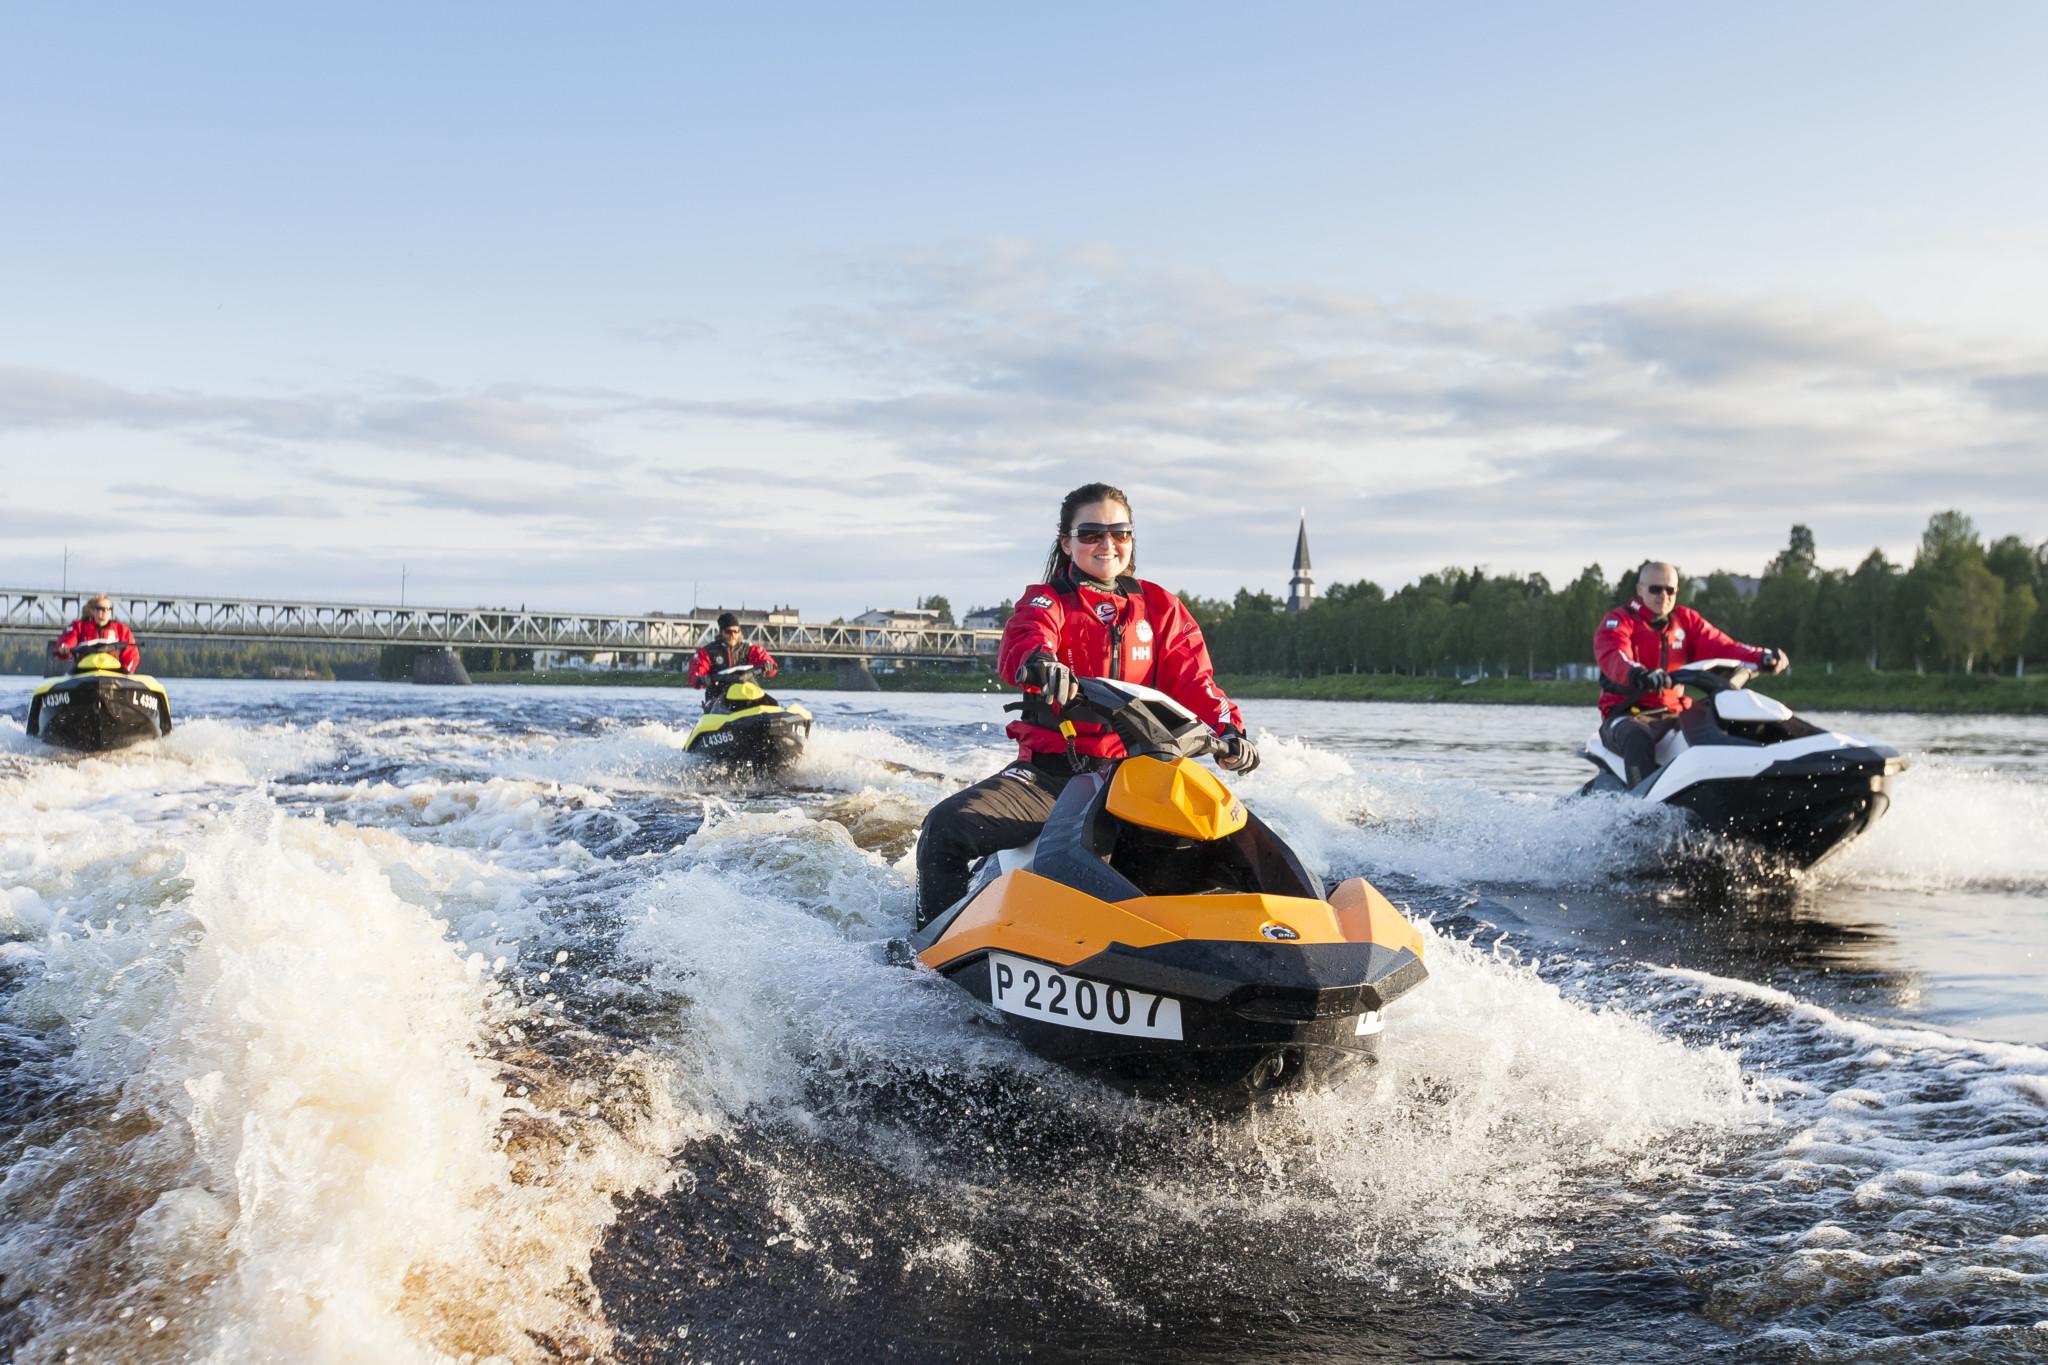 Jet skiing in Kemijoki River, Arctic Lifestyle, Rovaniemi